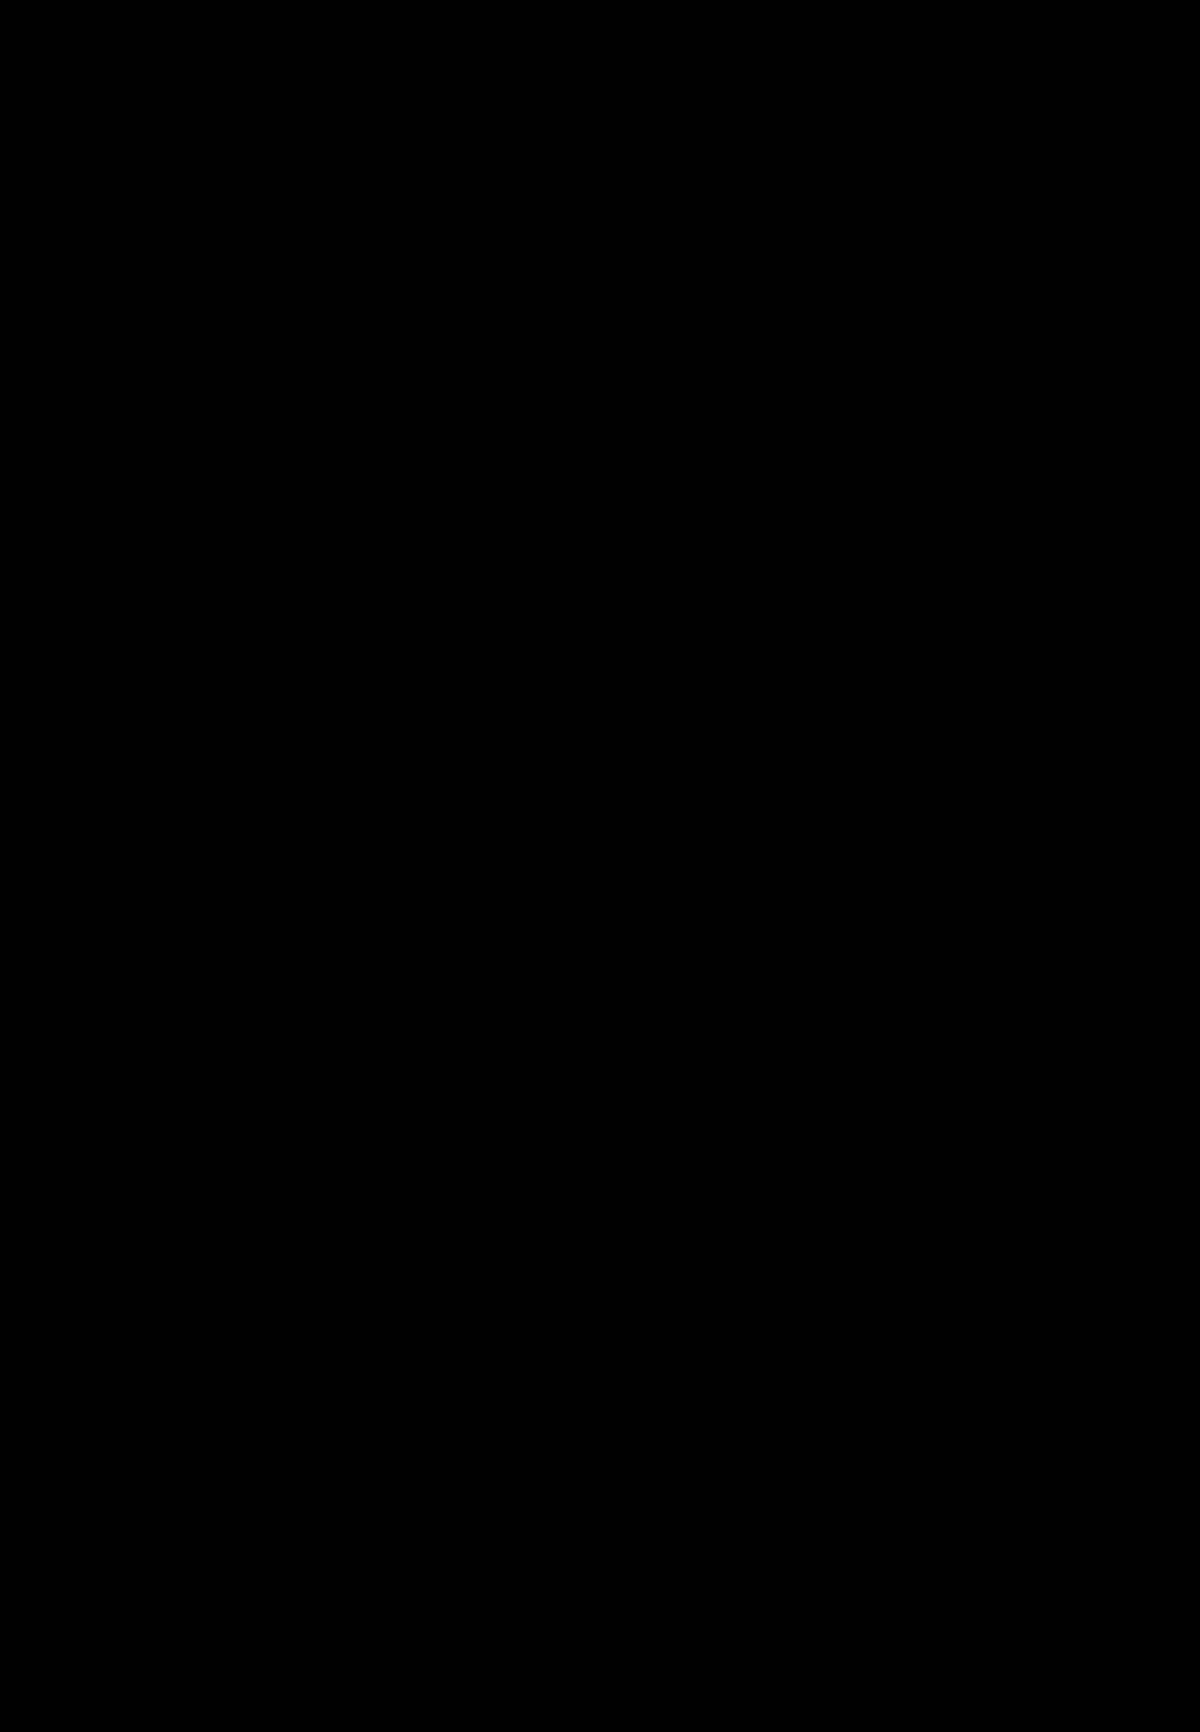 [Macxe's (monmon)] Tokubousentai Dinaranger ~Heroine Kairaku Sennou Keikaku~ Vol.01/02/03 (Renkaban) [Digital] 116